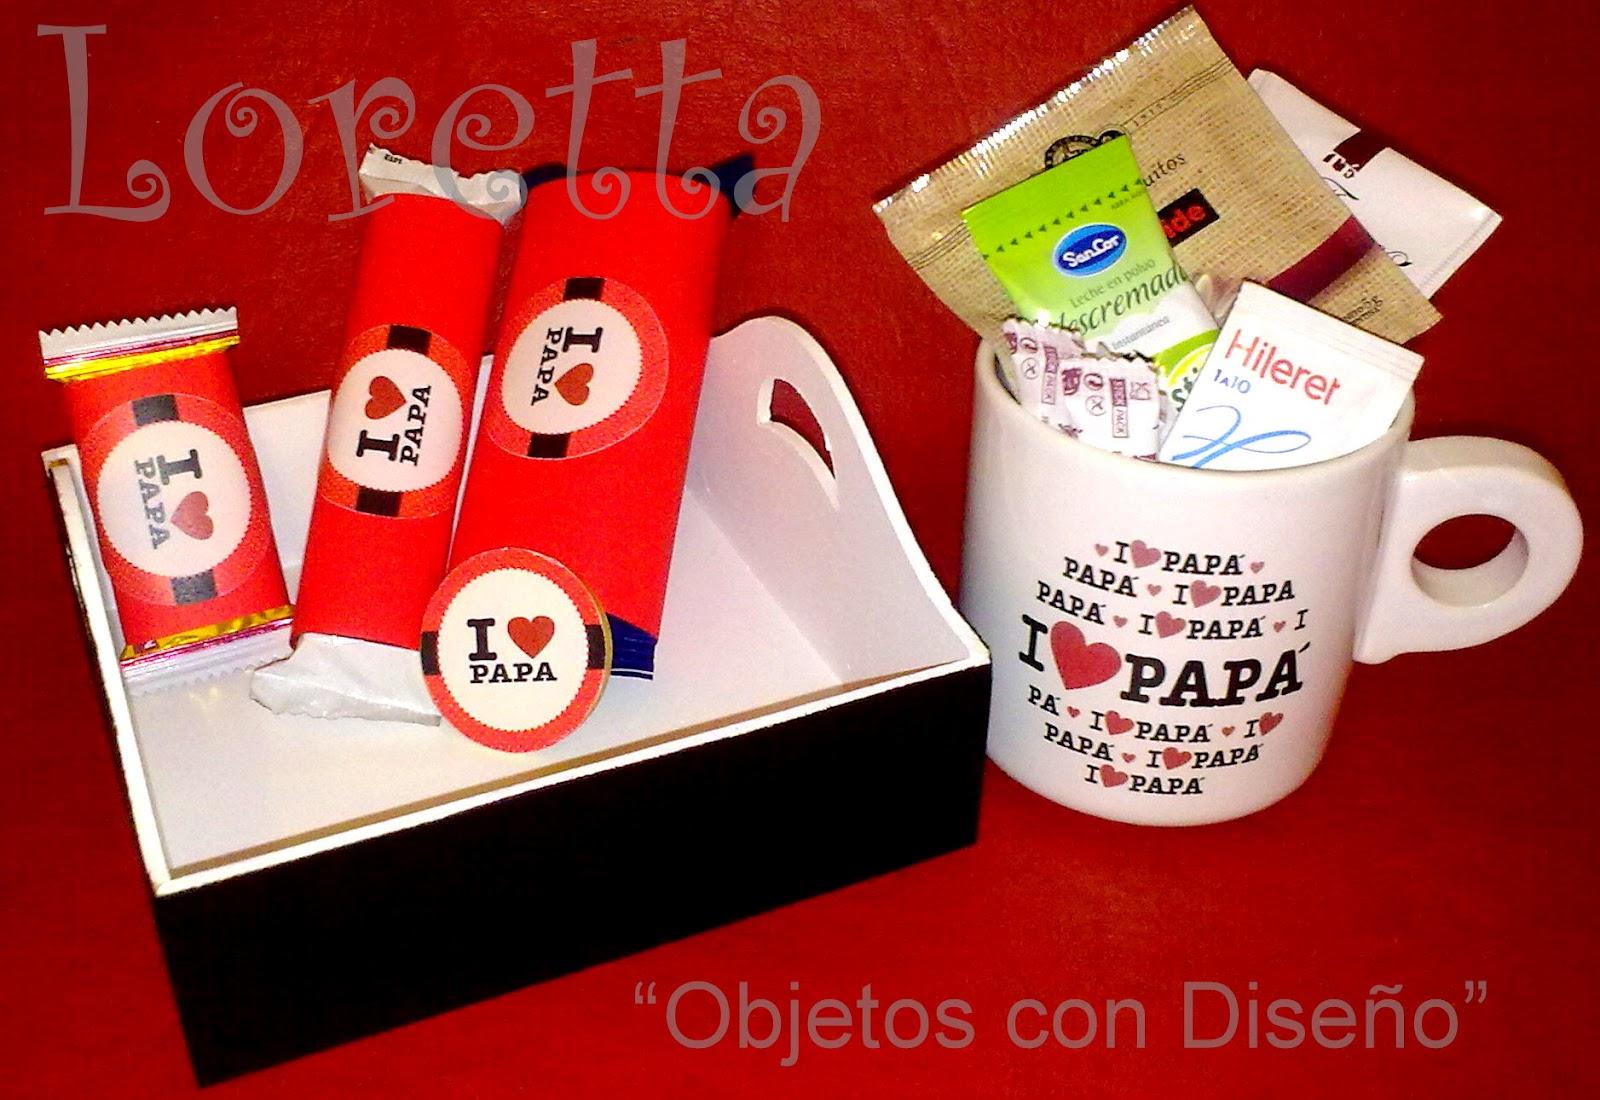 Loretta objetos con dise o decoraci n tem tica d a del - Objetos decoracion diseno ...